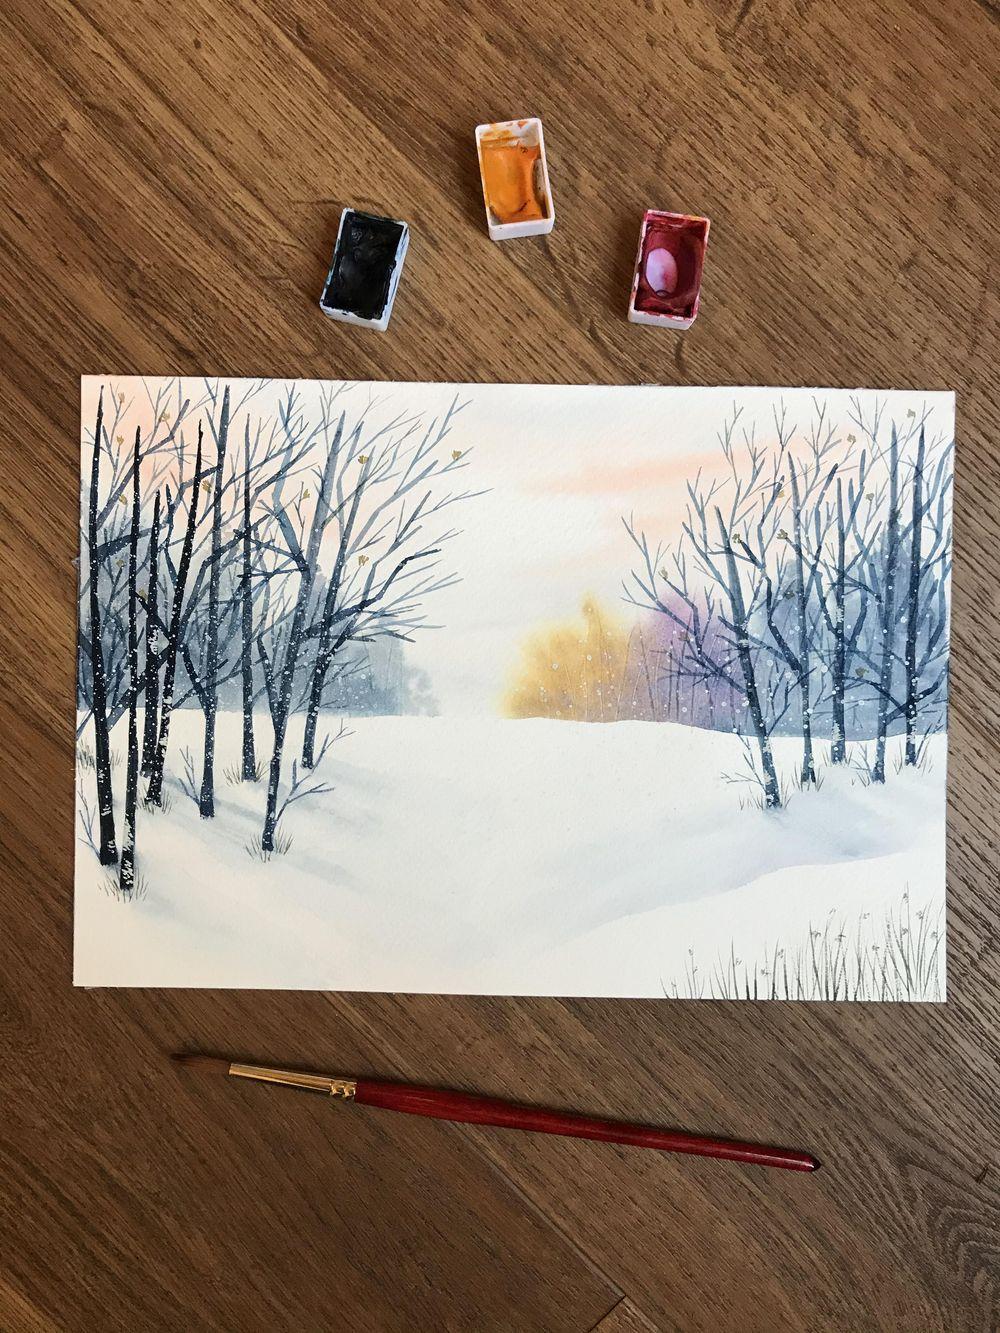 Winter scene - image 1 - student project